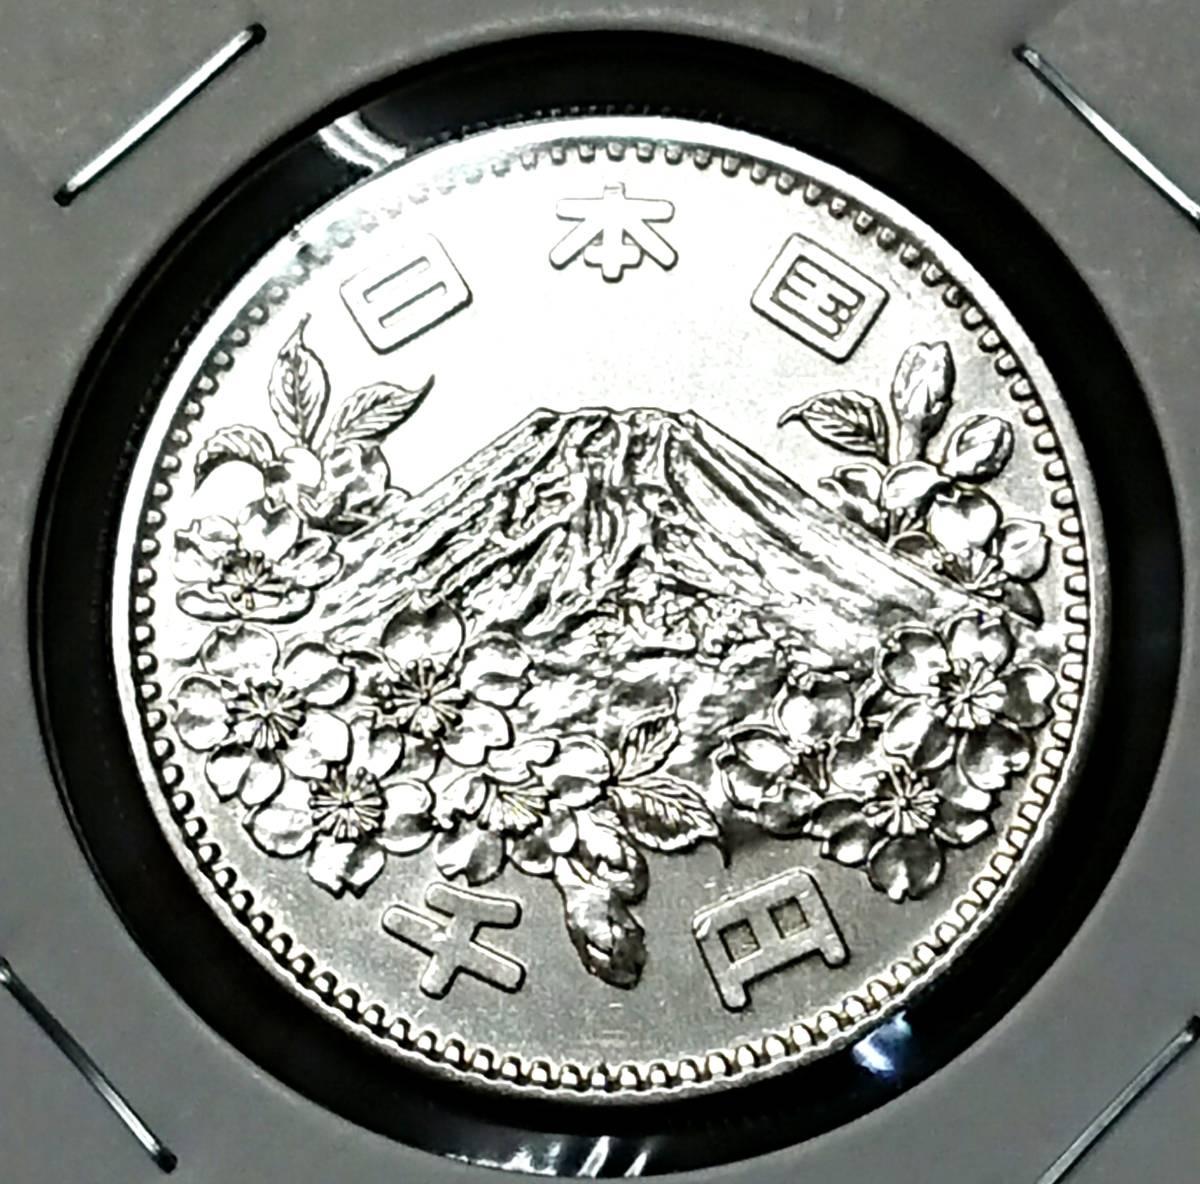 ☆昭和39年東京オリンピック記念1000円銀貨未使用美品《貨幣硬貨》②☆_画像3